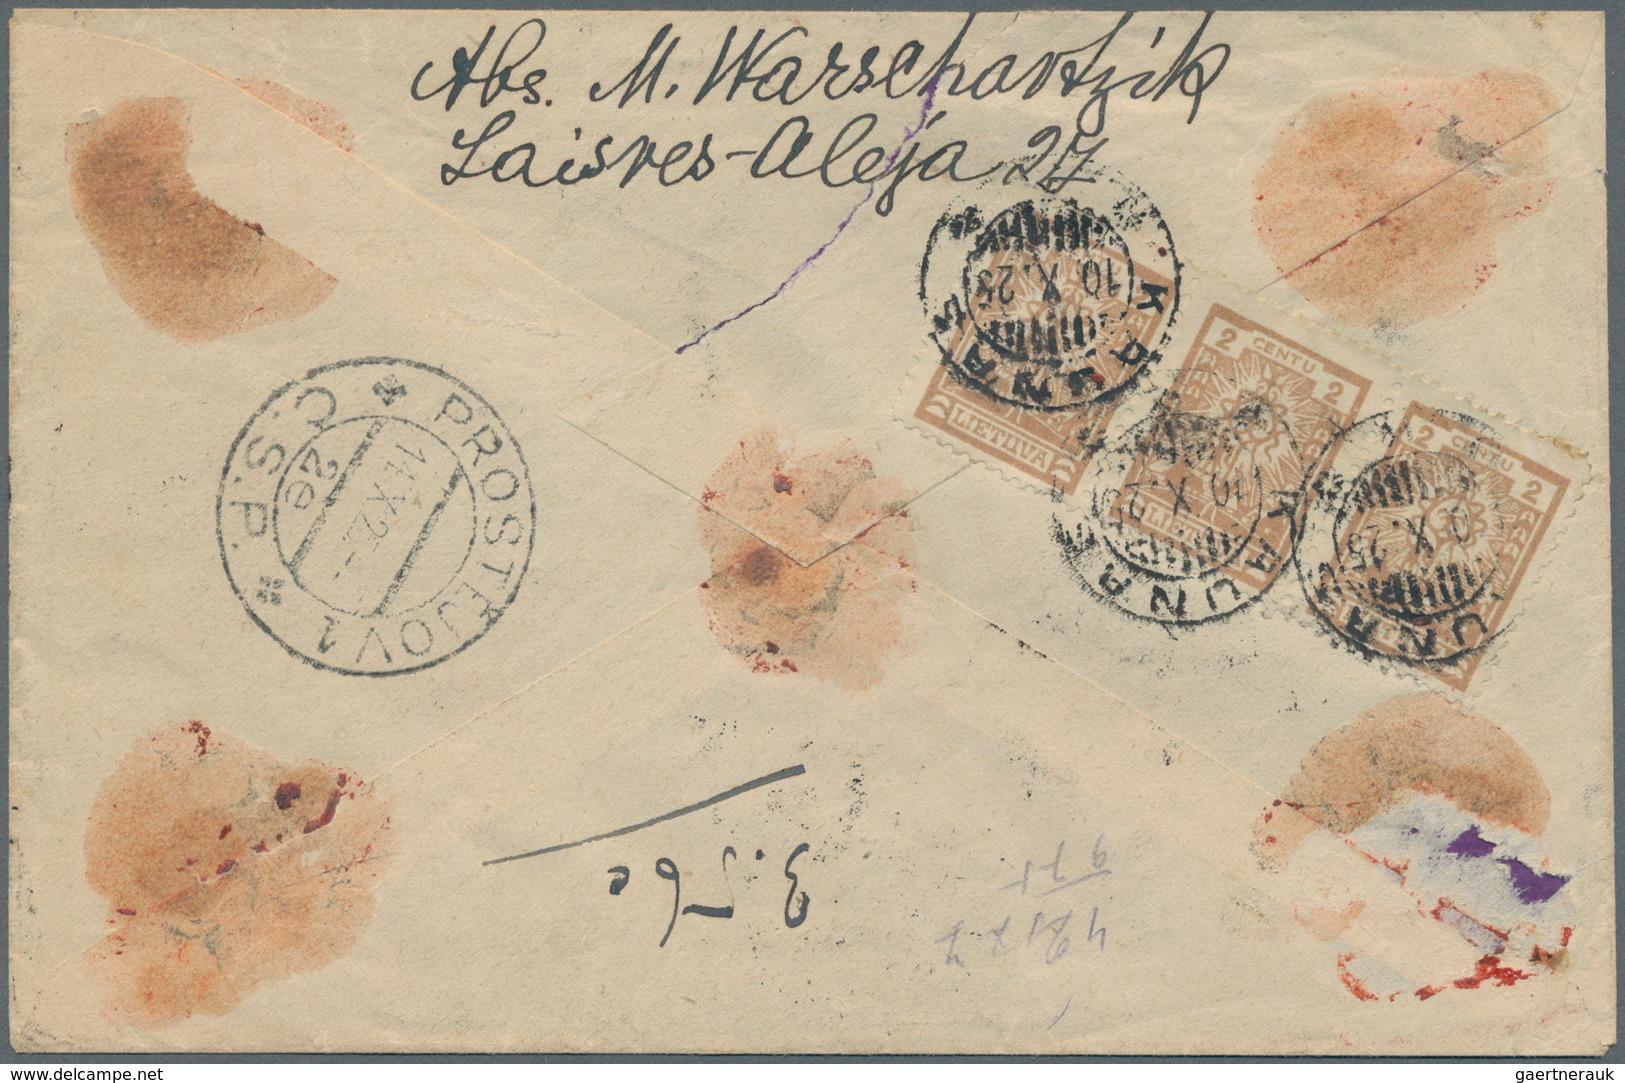 Lettland: 1925. Registered Value Declared Letter (425 Frs) To An Address In Czechoslovakia, Franked - Lettland